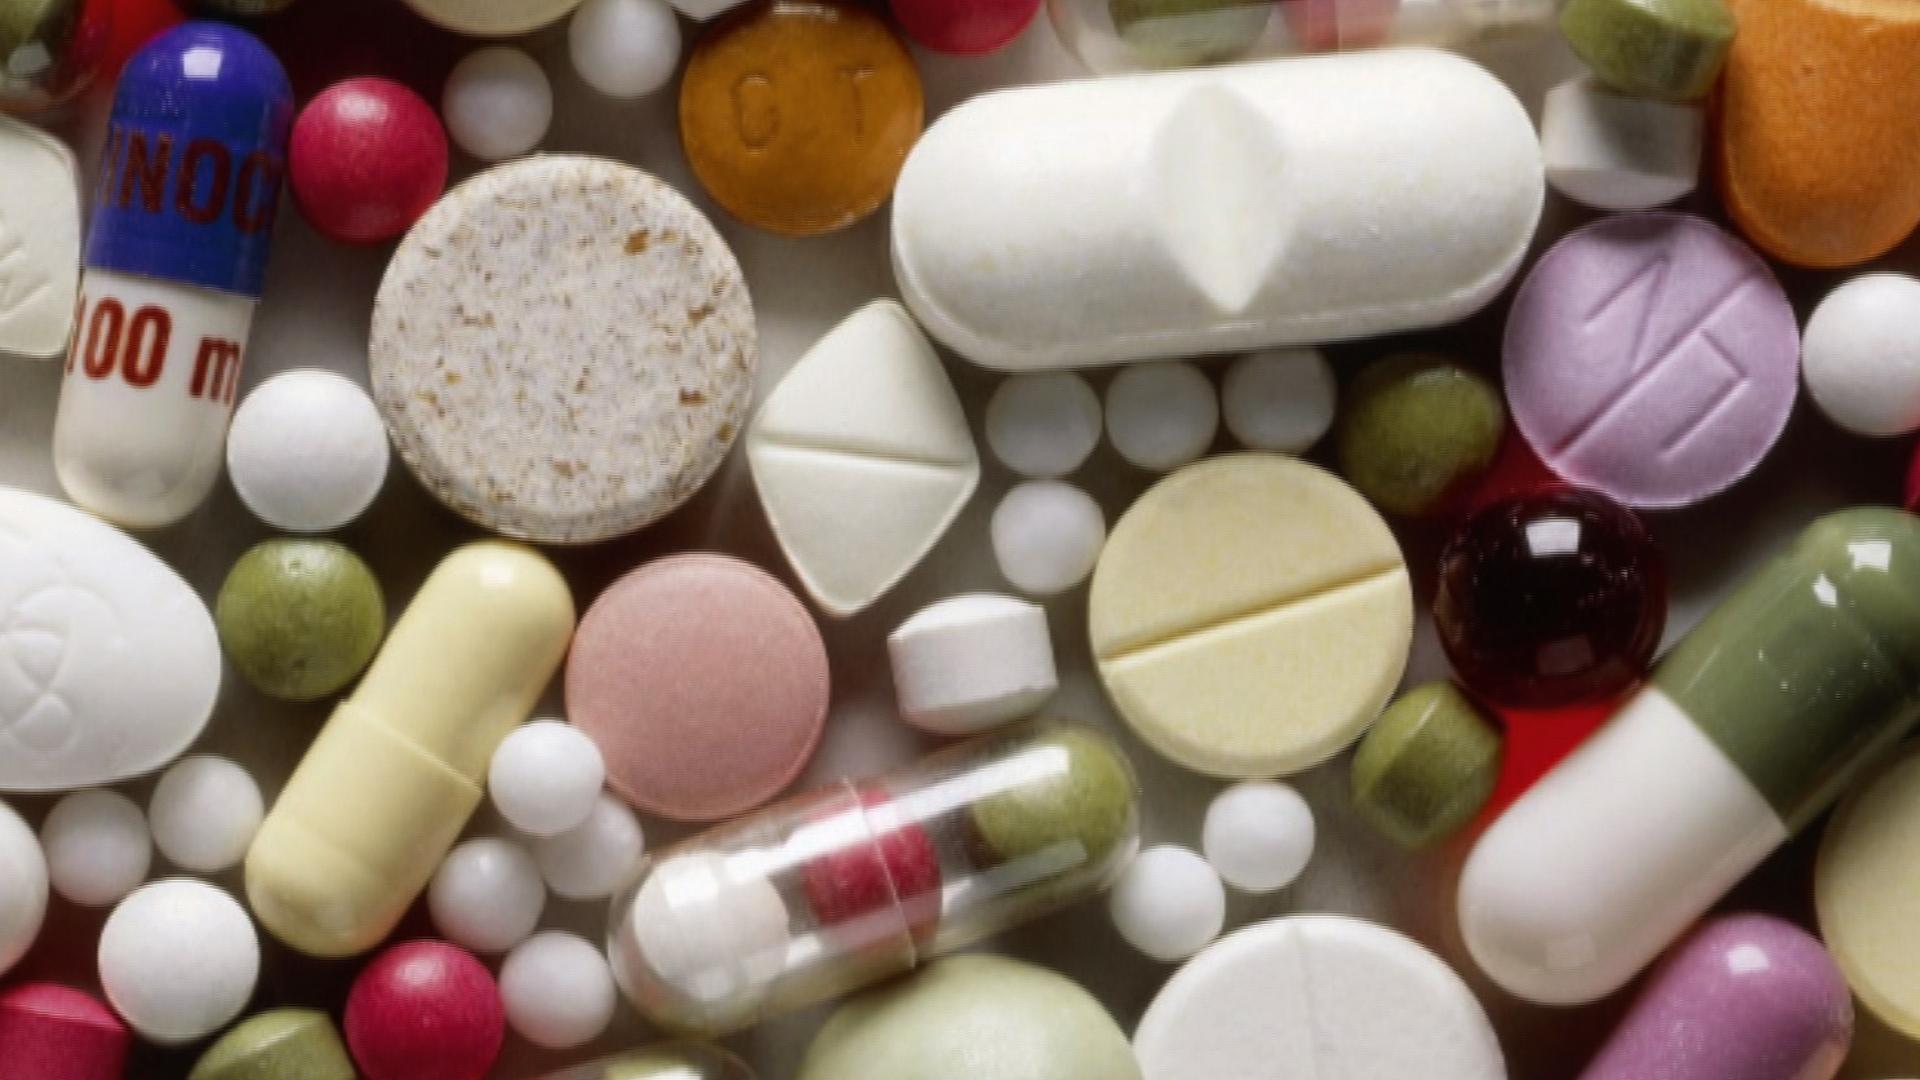 fd3b85425c4 Pharmaceutical companies fund Interpol fight against fake ...